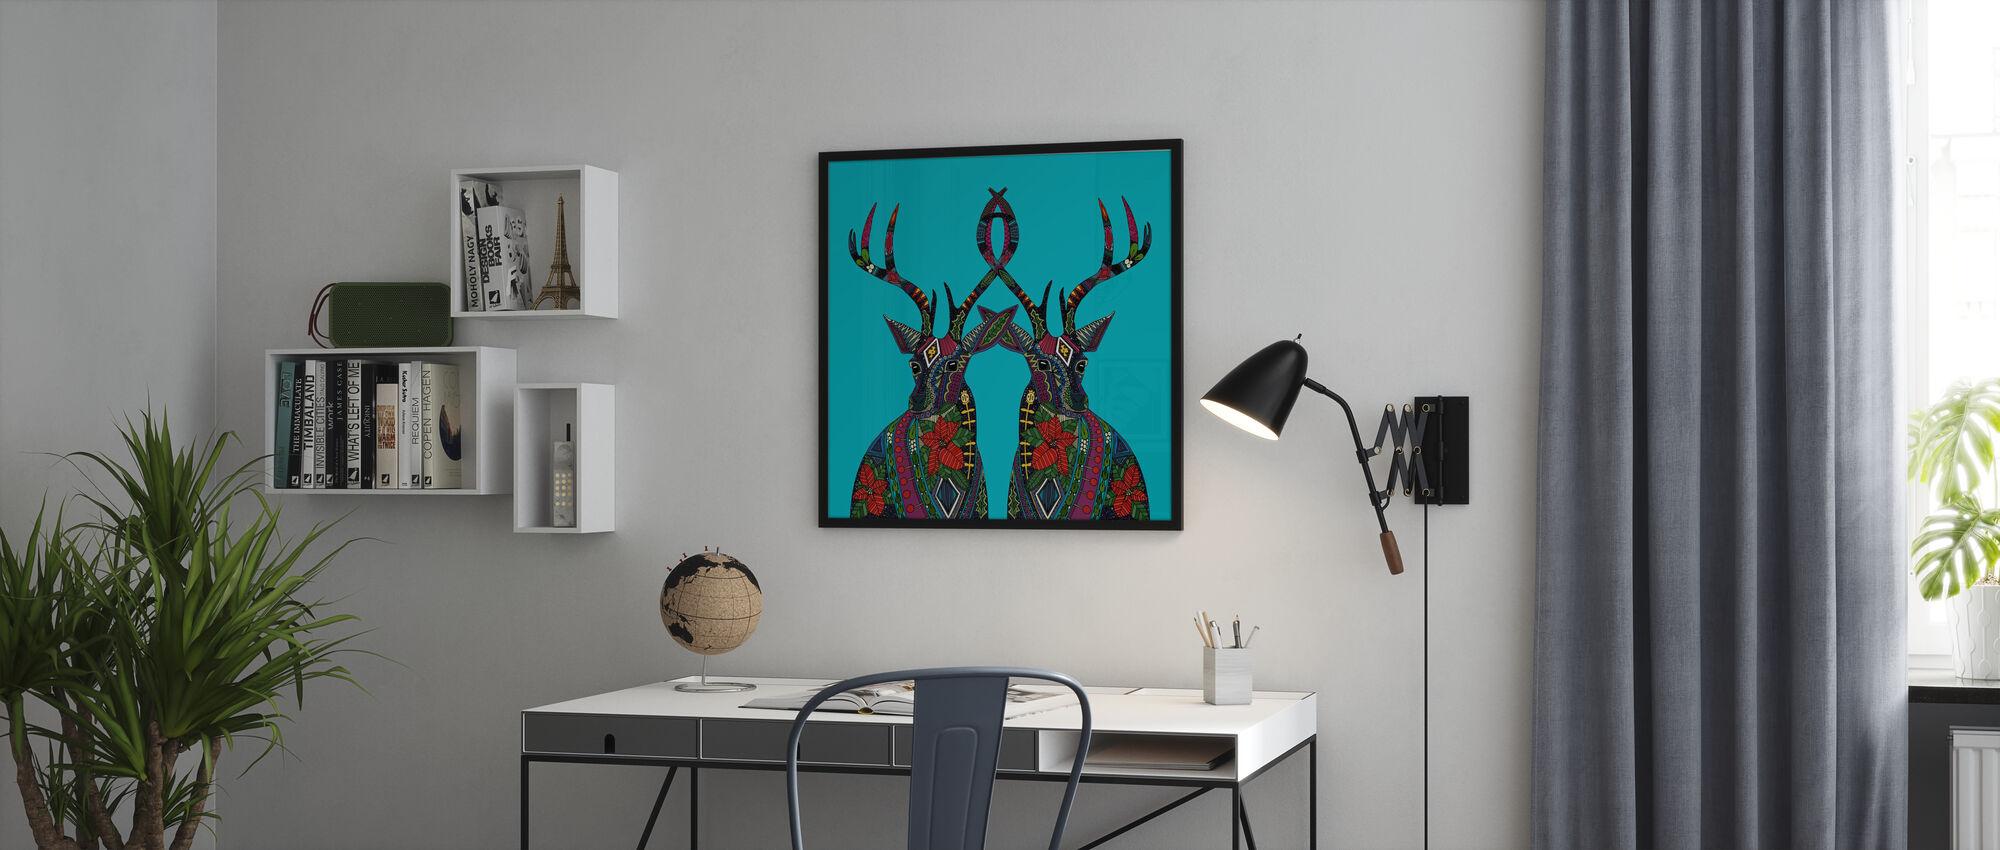 Poinsettia Deer - Poster - Office